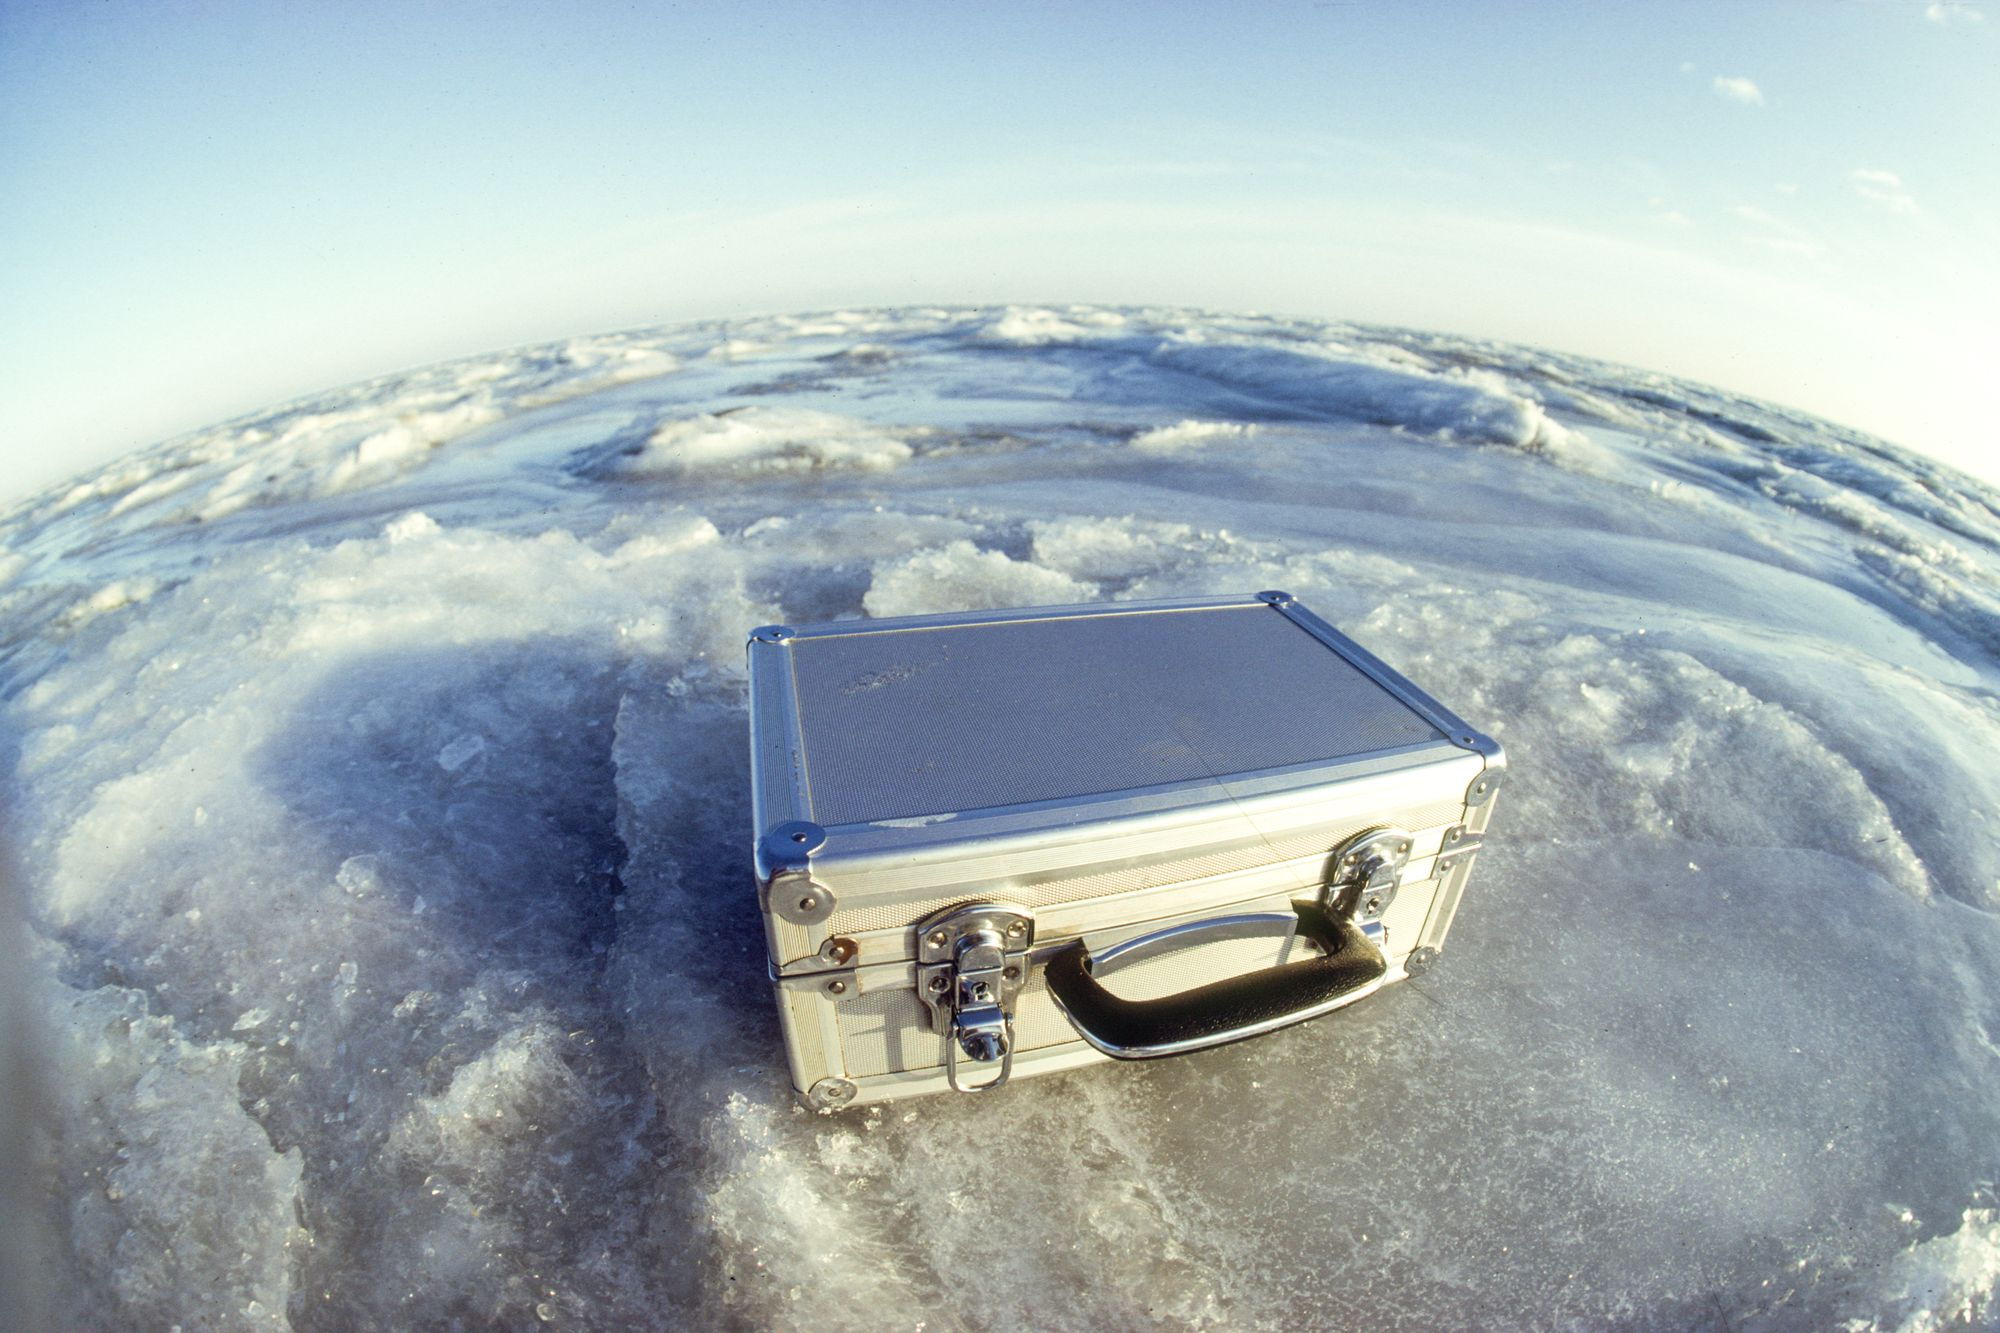 Aluminium Fotokoffer von Fotograf Svend Krumnacker 1985